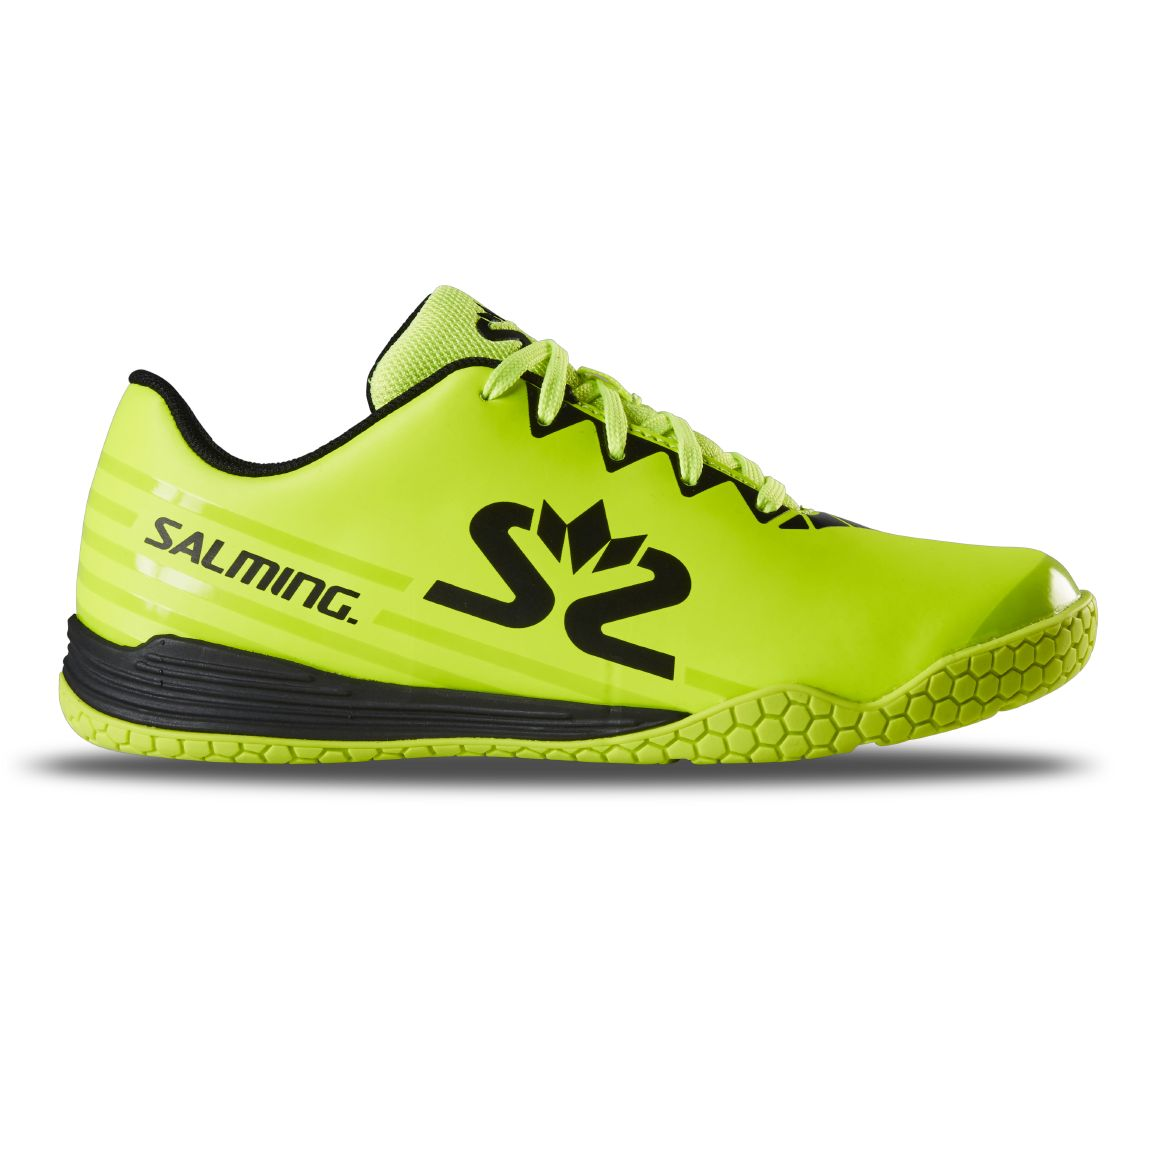 Salming Spark Shoe Kid Fluo Yellow/Black 2,5 UK - 35 EUR - 22,5 cm